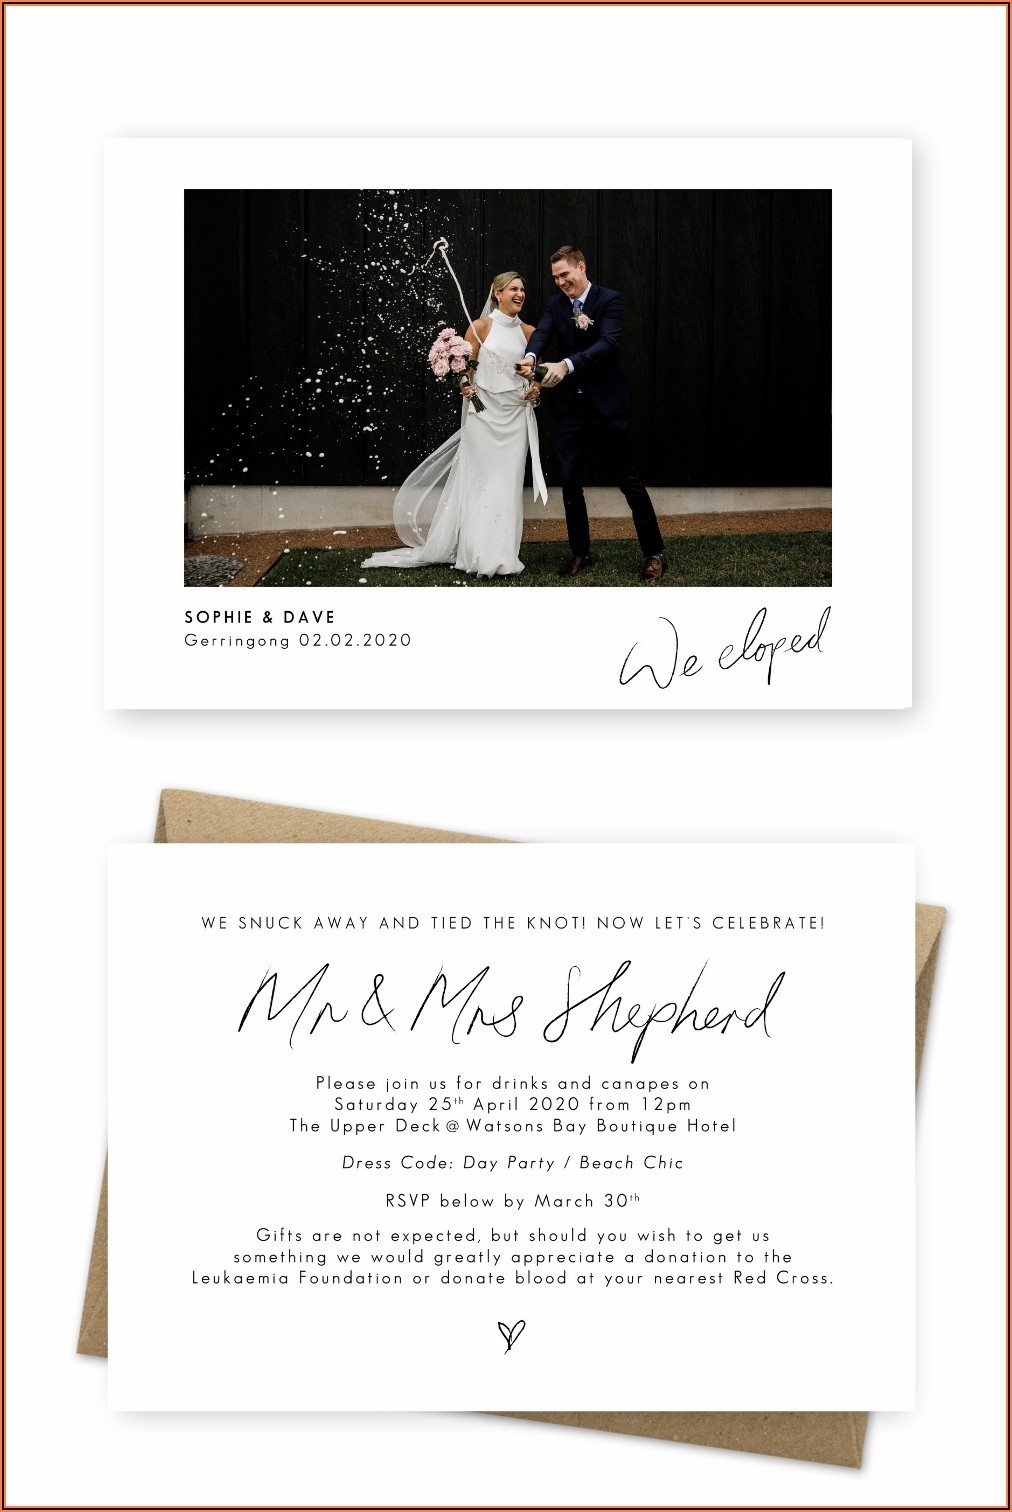 Wedding Announcement Cards Online